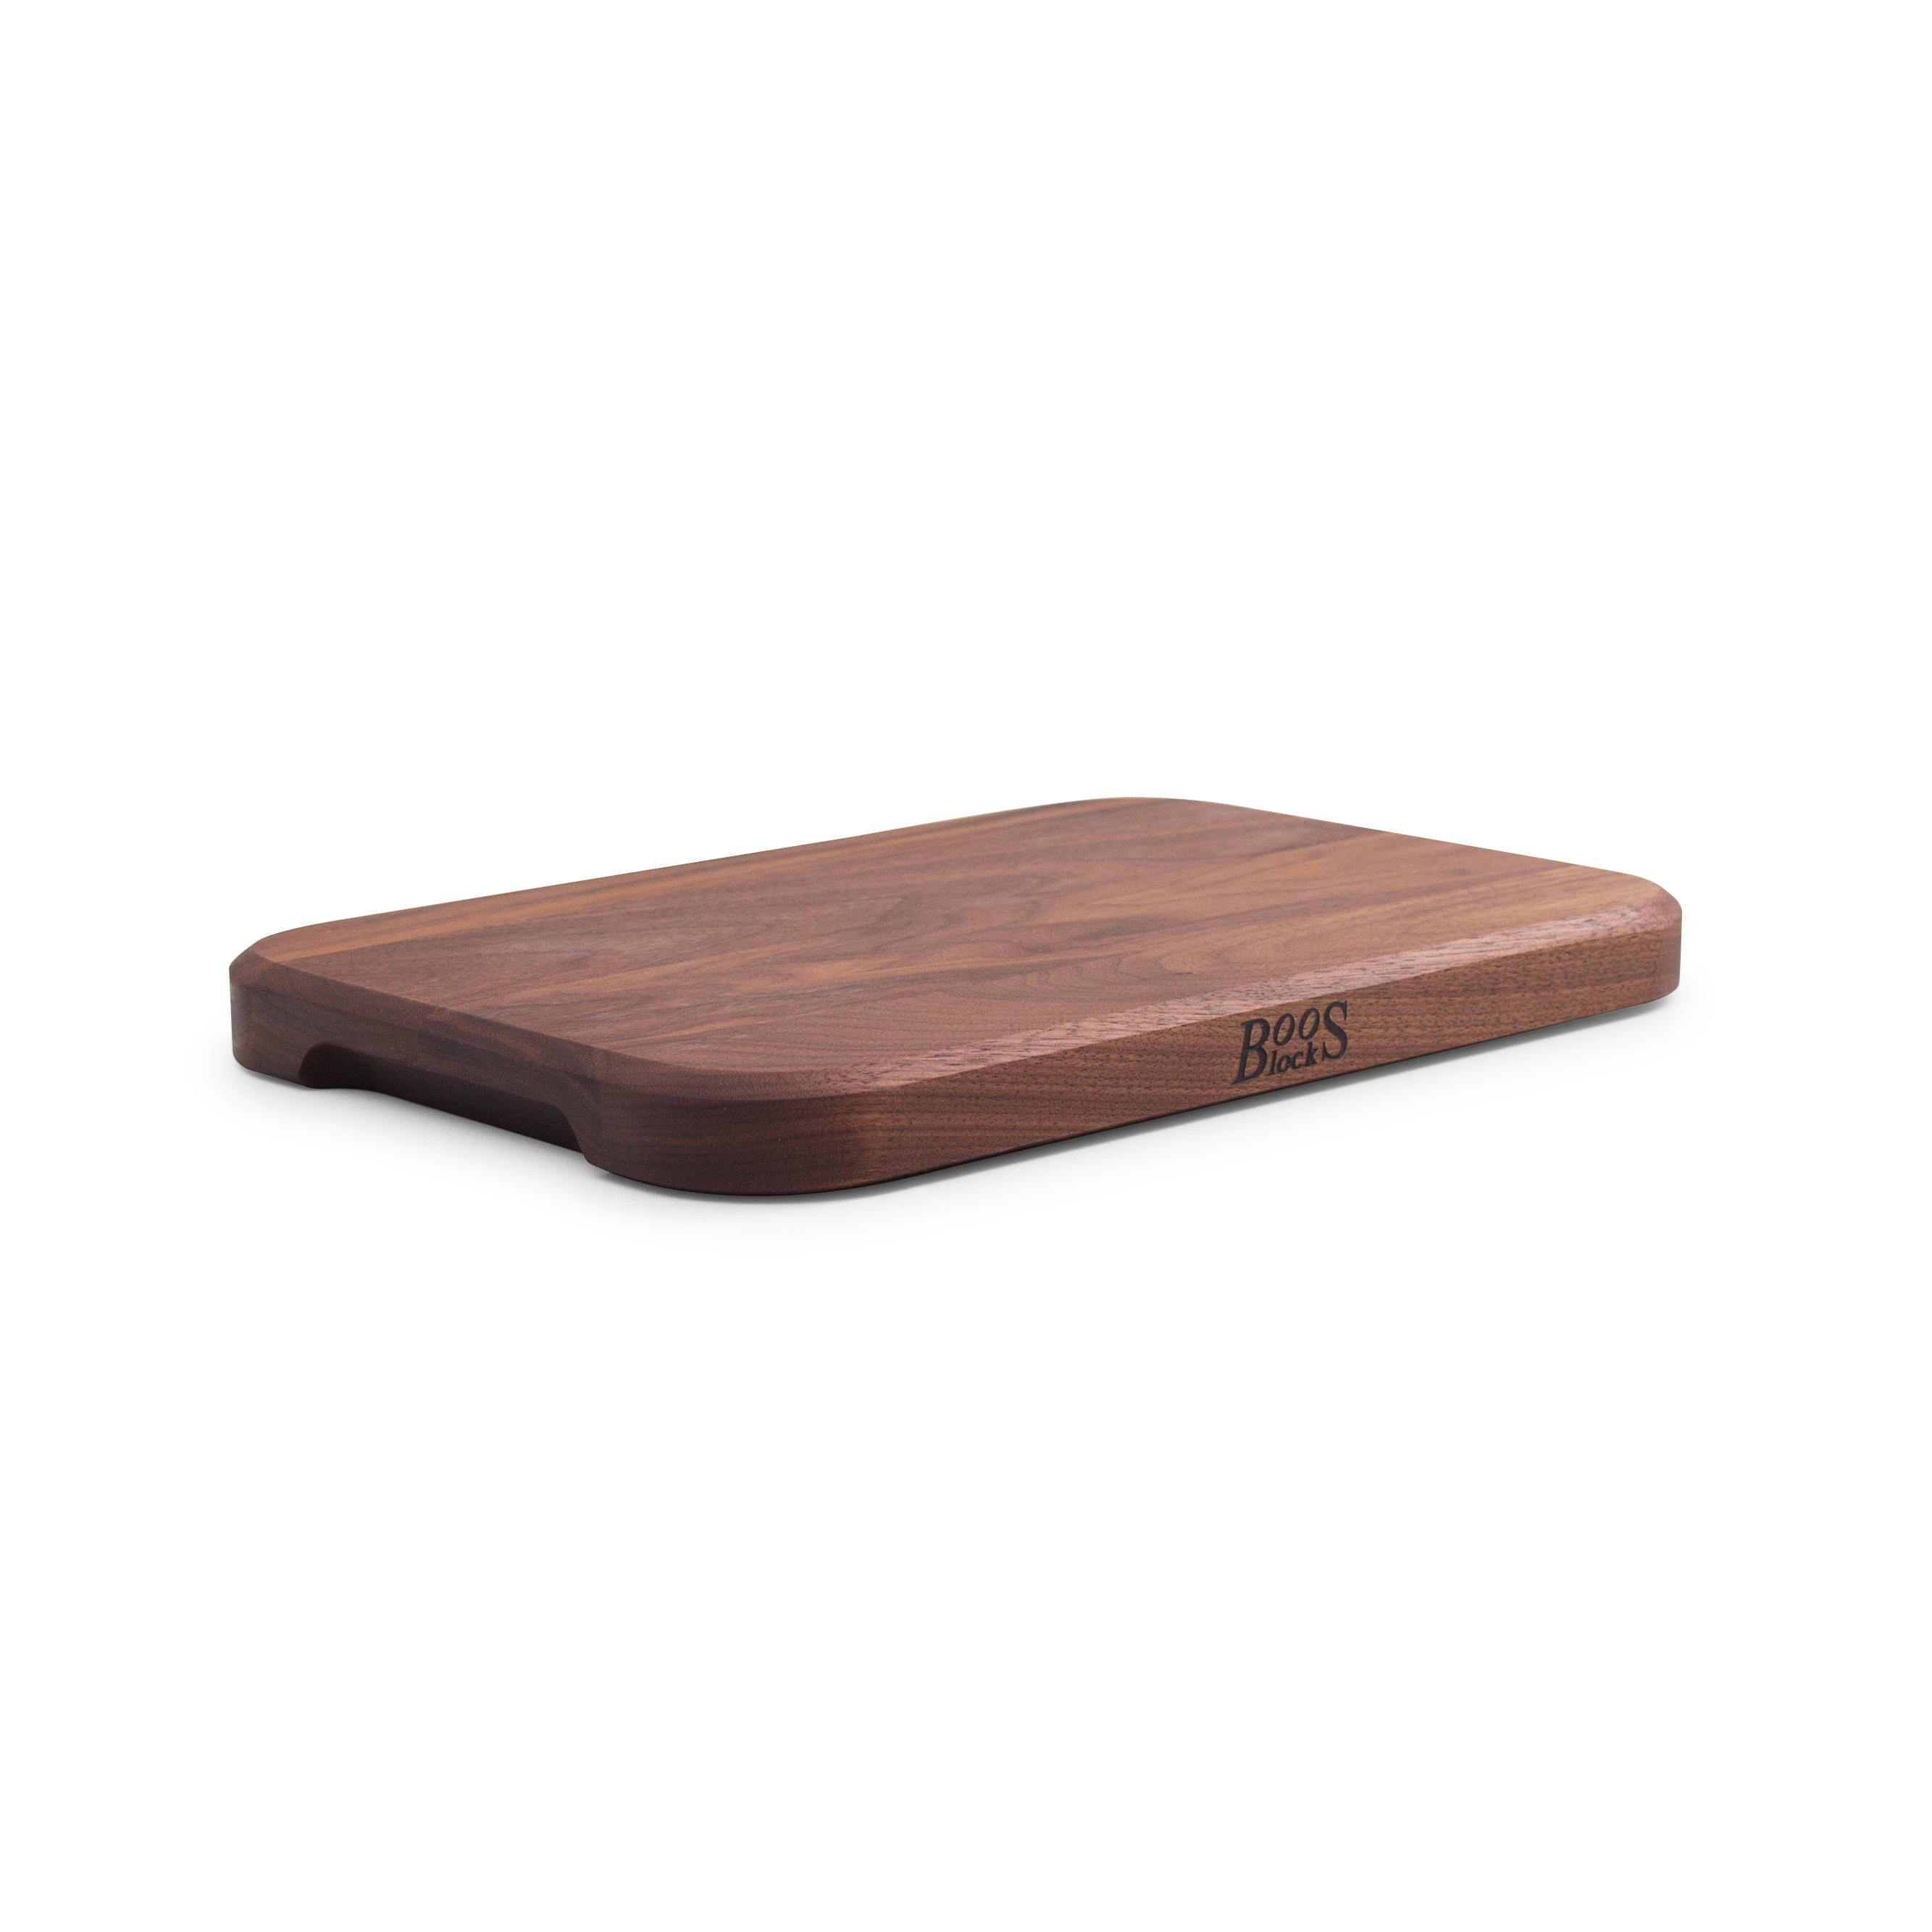 John Boos CB4C-W120801 cutting board, wood